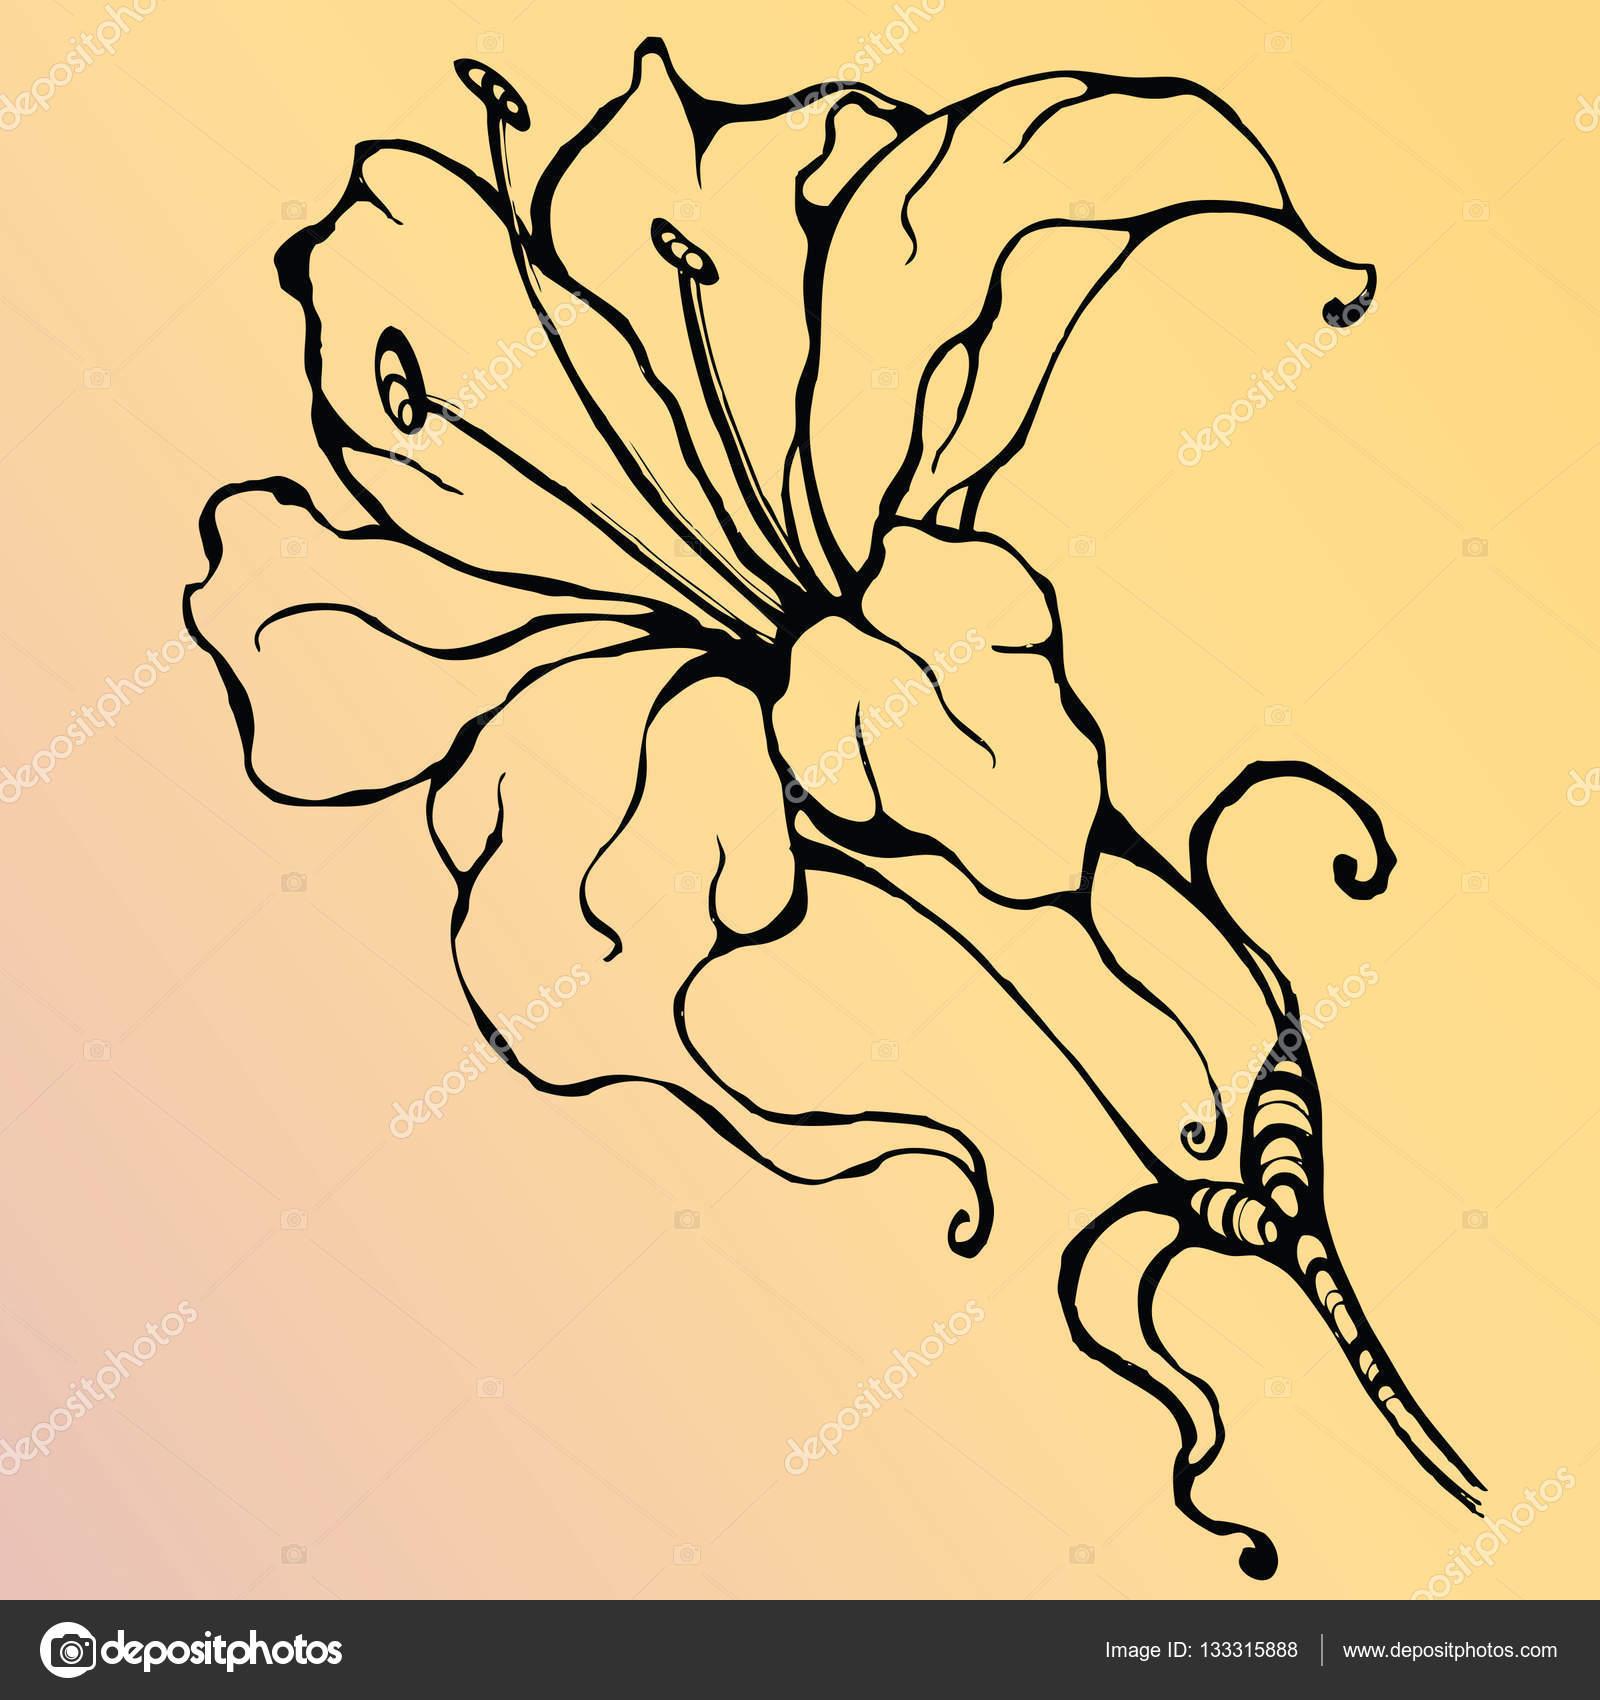 Elegant Lily Flower Stock Vector Aimimarin 133315888